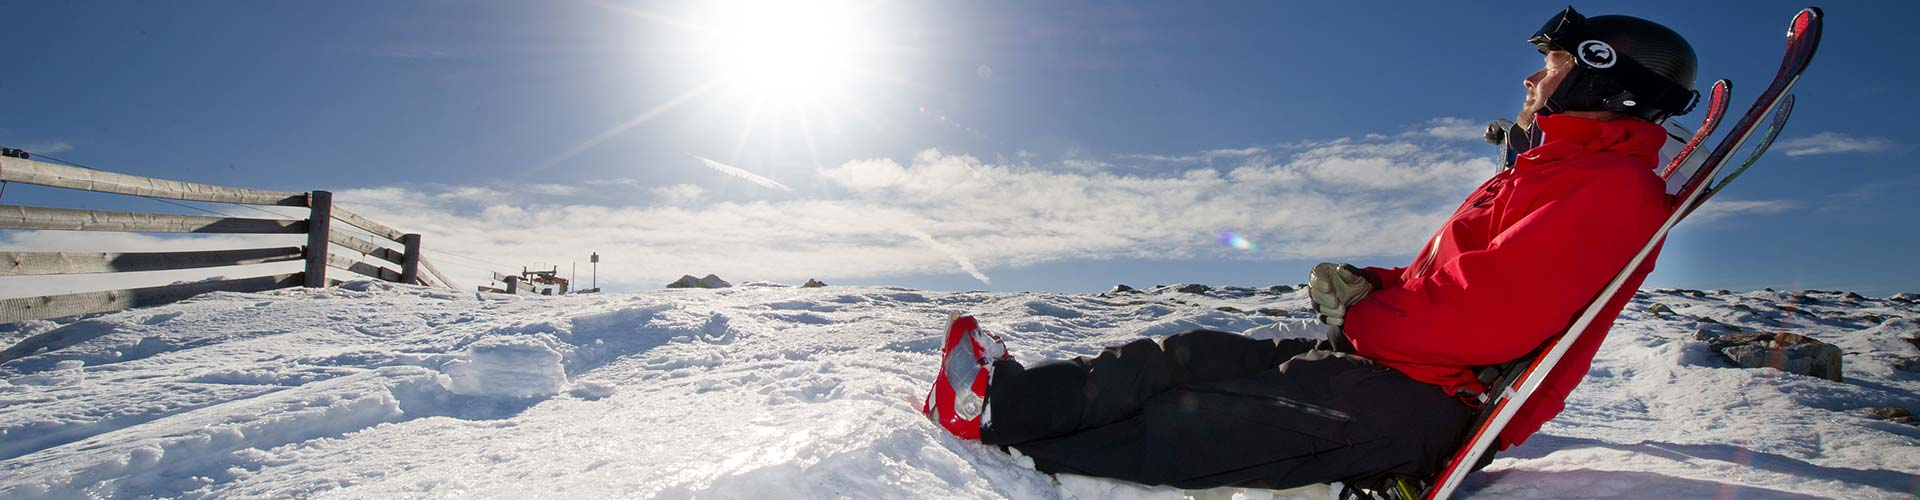 enjoy_winter_skiing